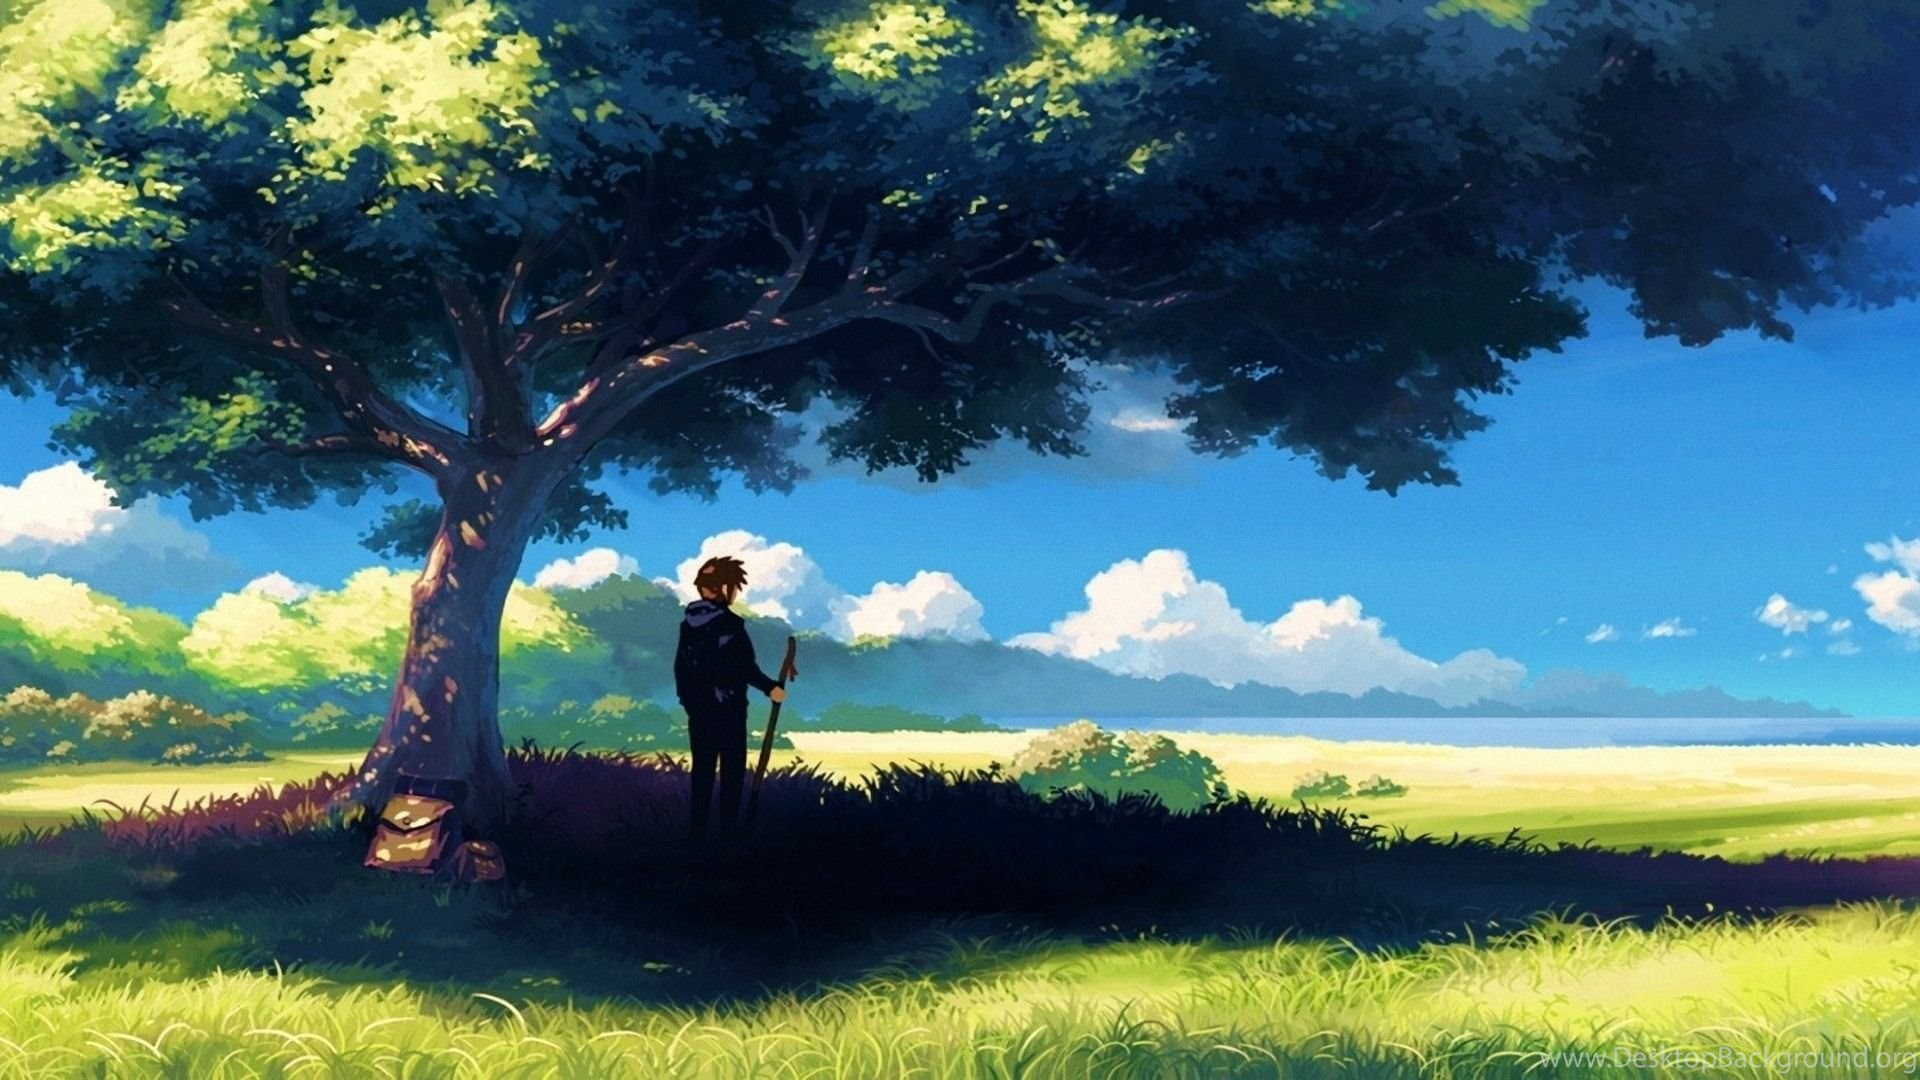 1920x1080 Anime, Scenery, Boy Under Tree, Anime Scenery ...